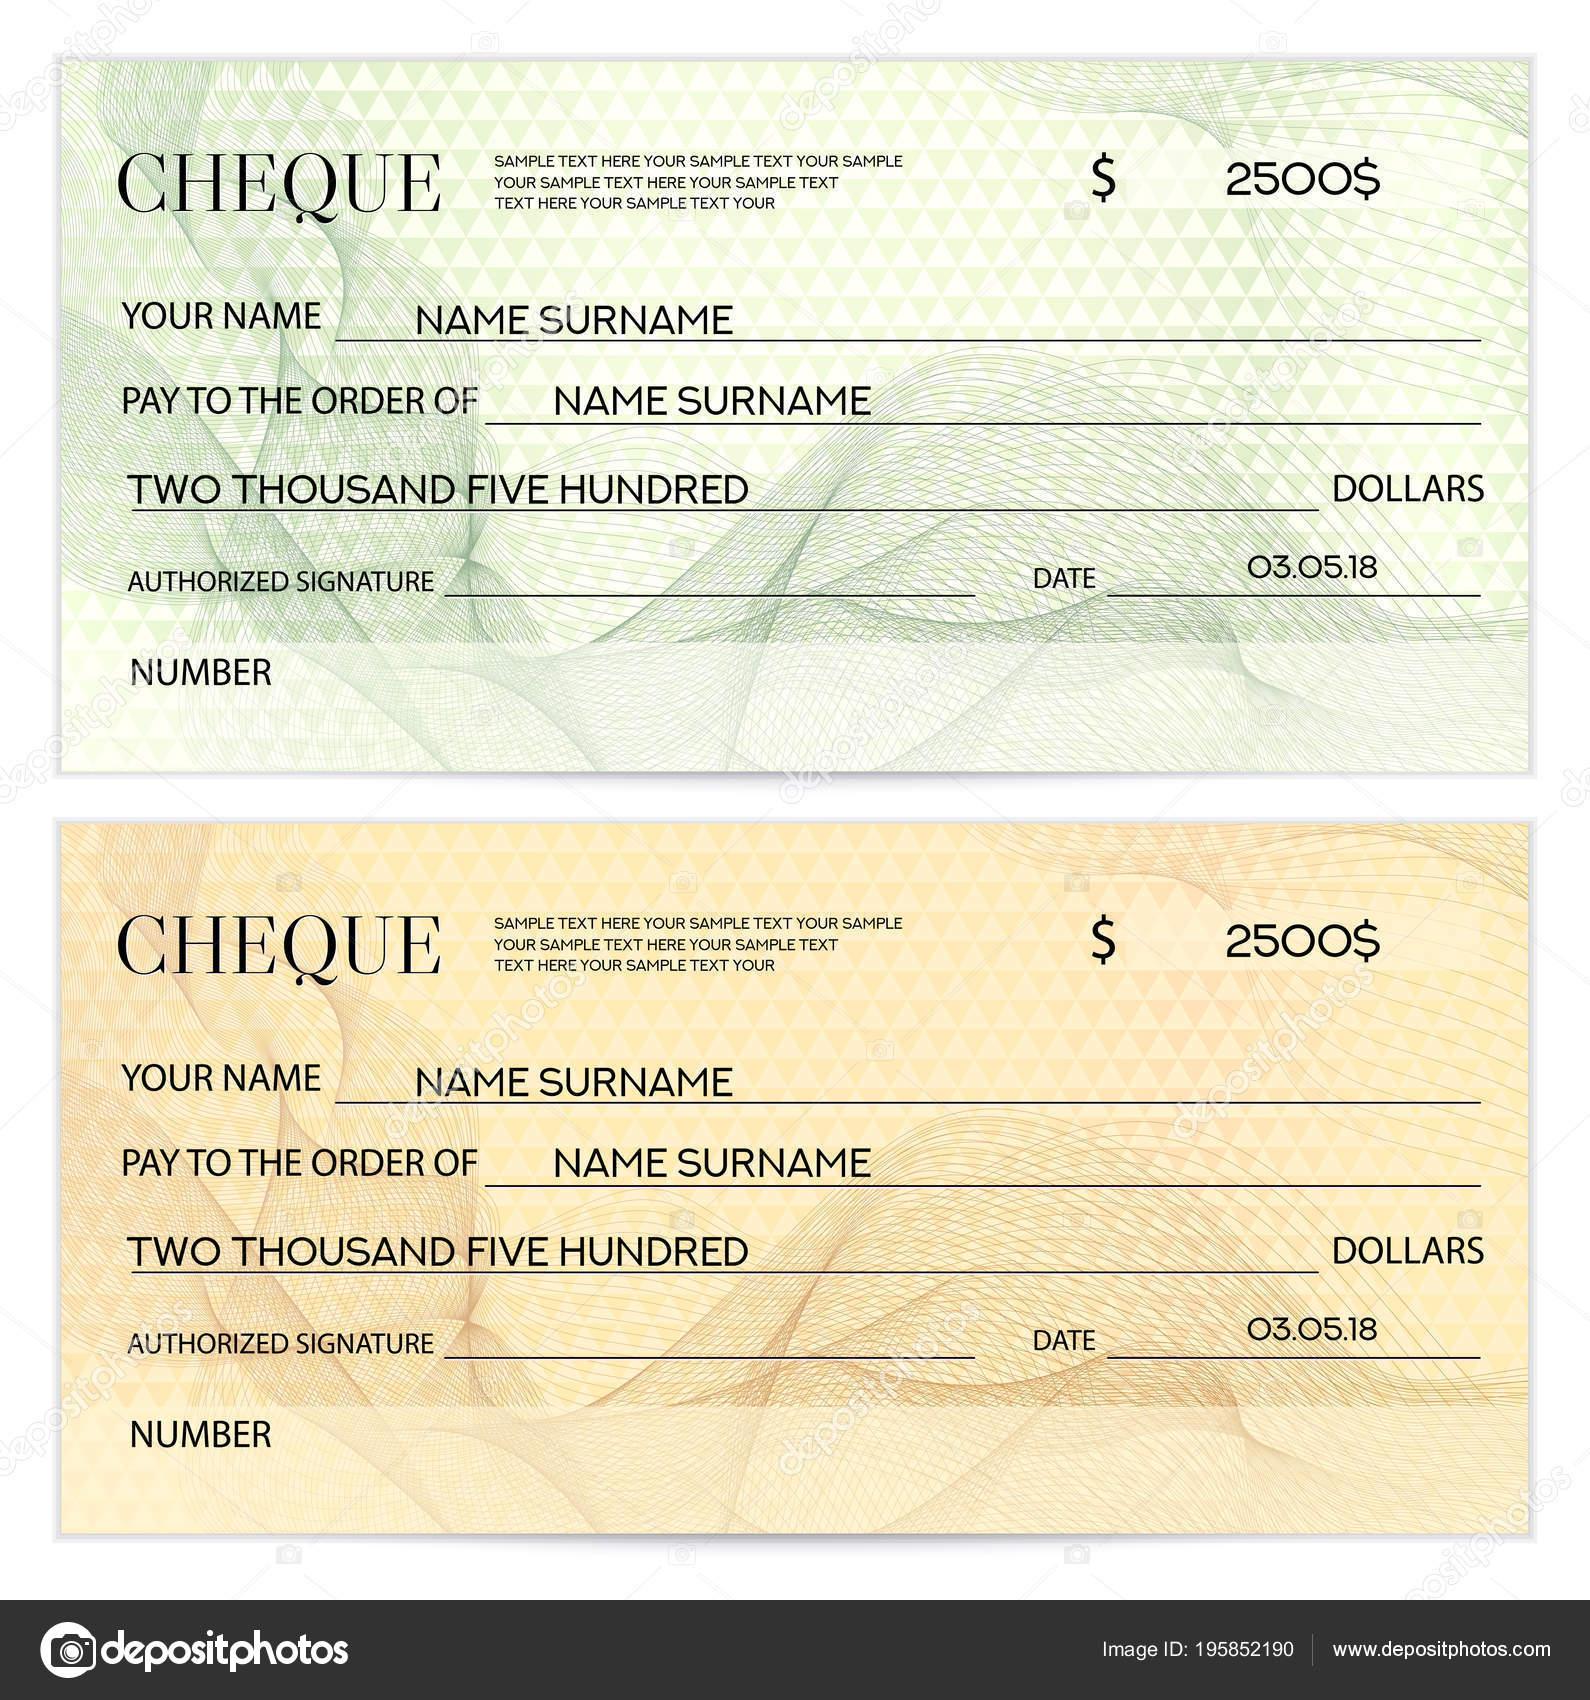 Check Cheque Chequebook Template Guilloche Pattern Watermark ...